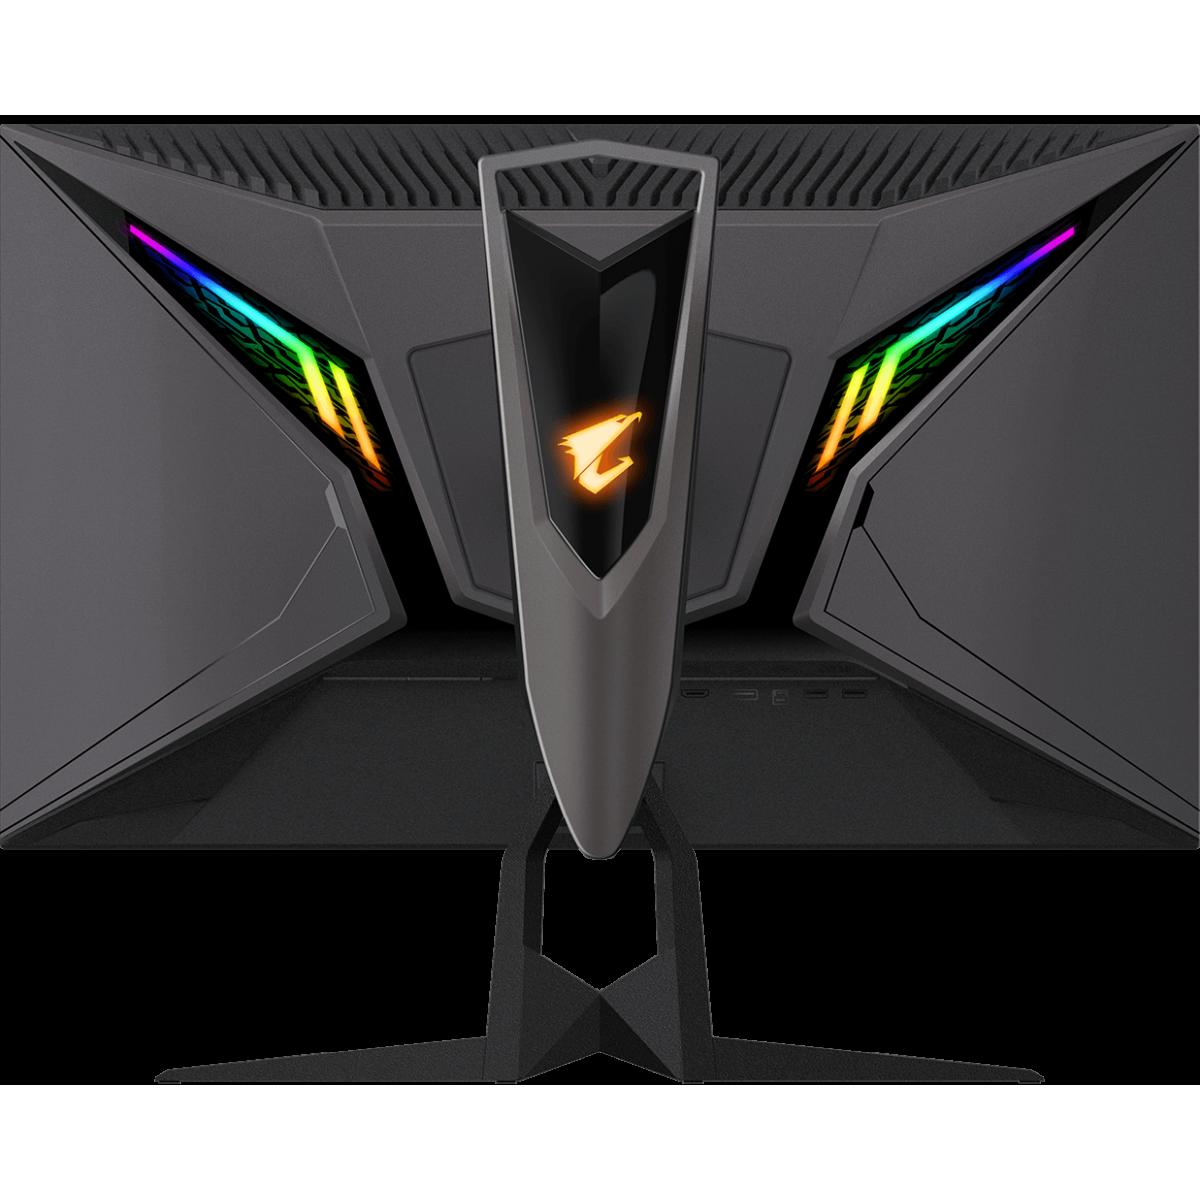 Monitor Gamer Gigabyte Aorus, 27 Pol, 165Hz, 1ms, FreeSync/G-Sync, QHD, HDMI, Display Port, FI27Q-P